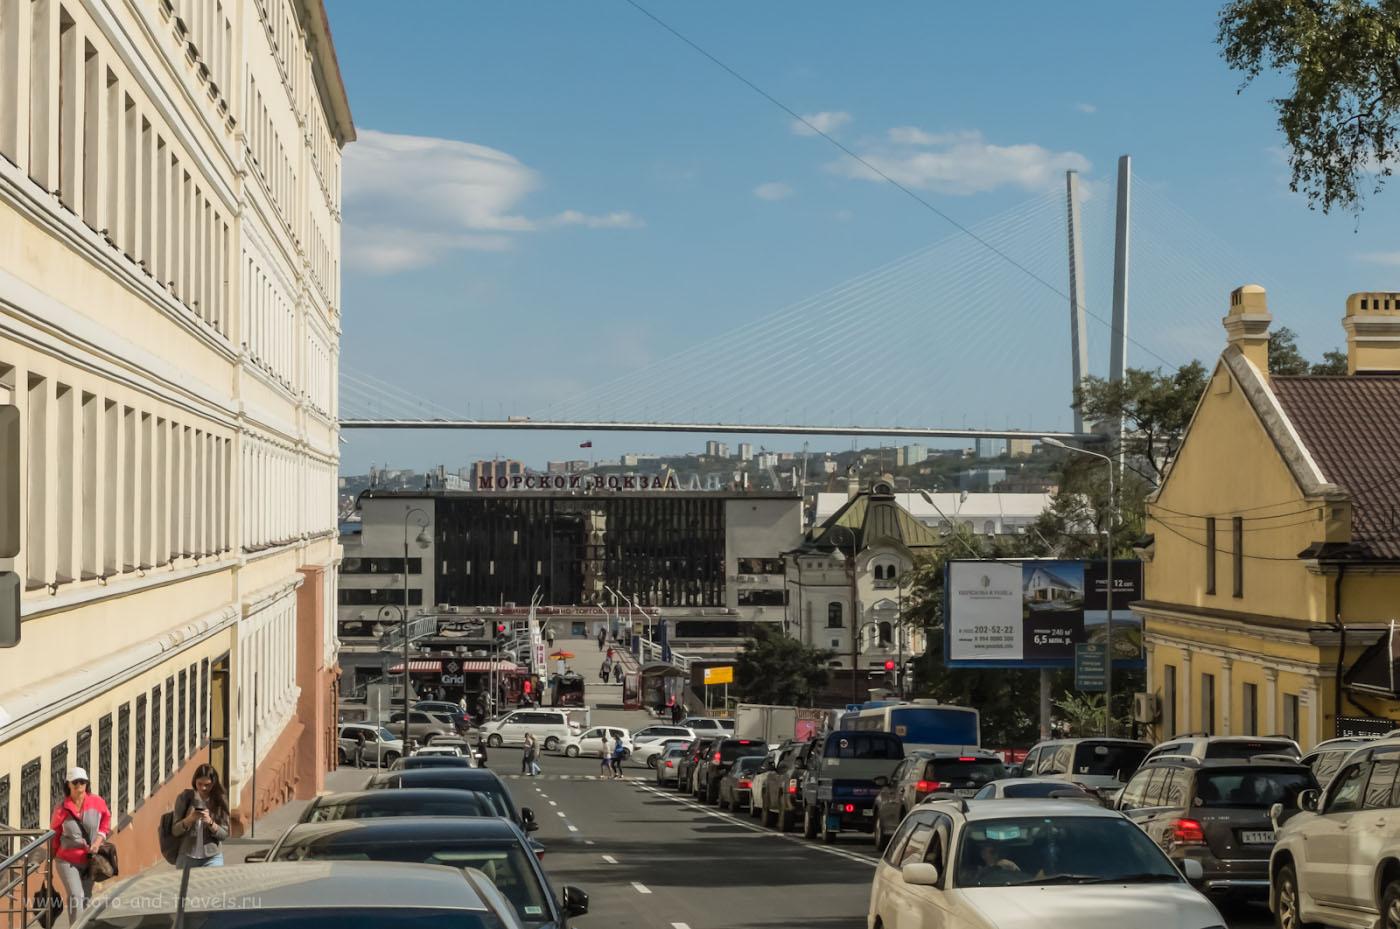 Фото 13. Морской вокзал Владивостока. Фотопрогулка с Fujifilm X30. Настройки: 1/2200, -1.0, 7.1, 200, 16.7.